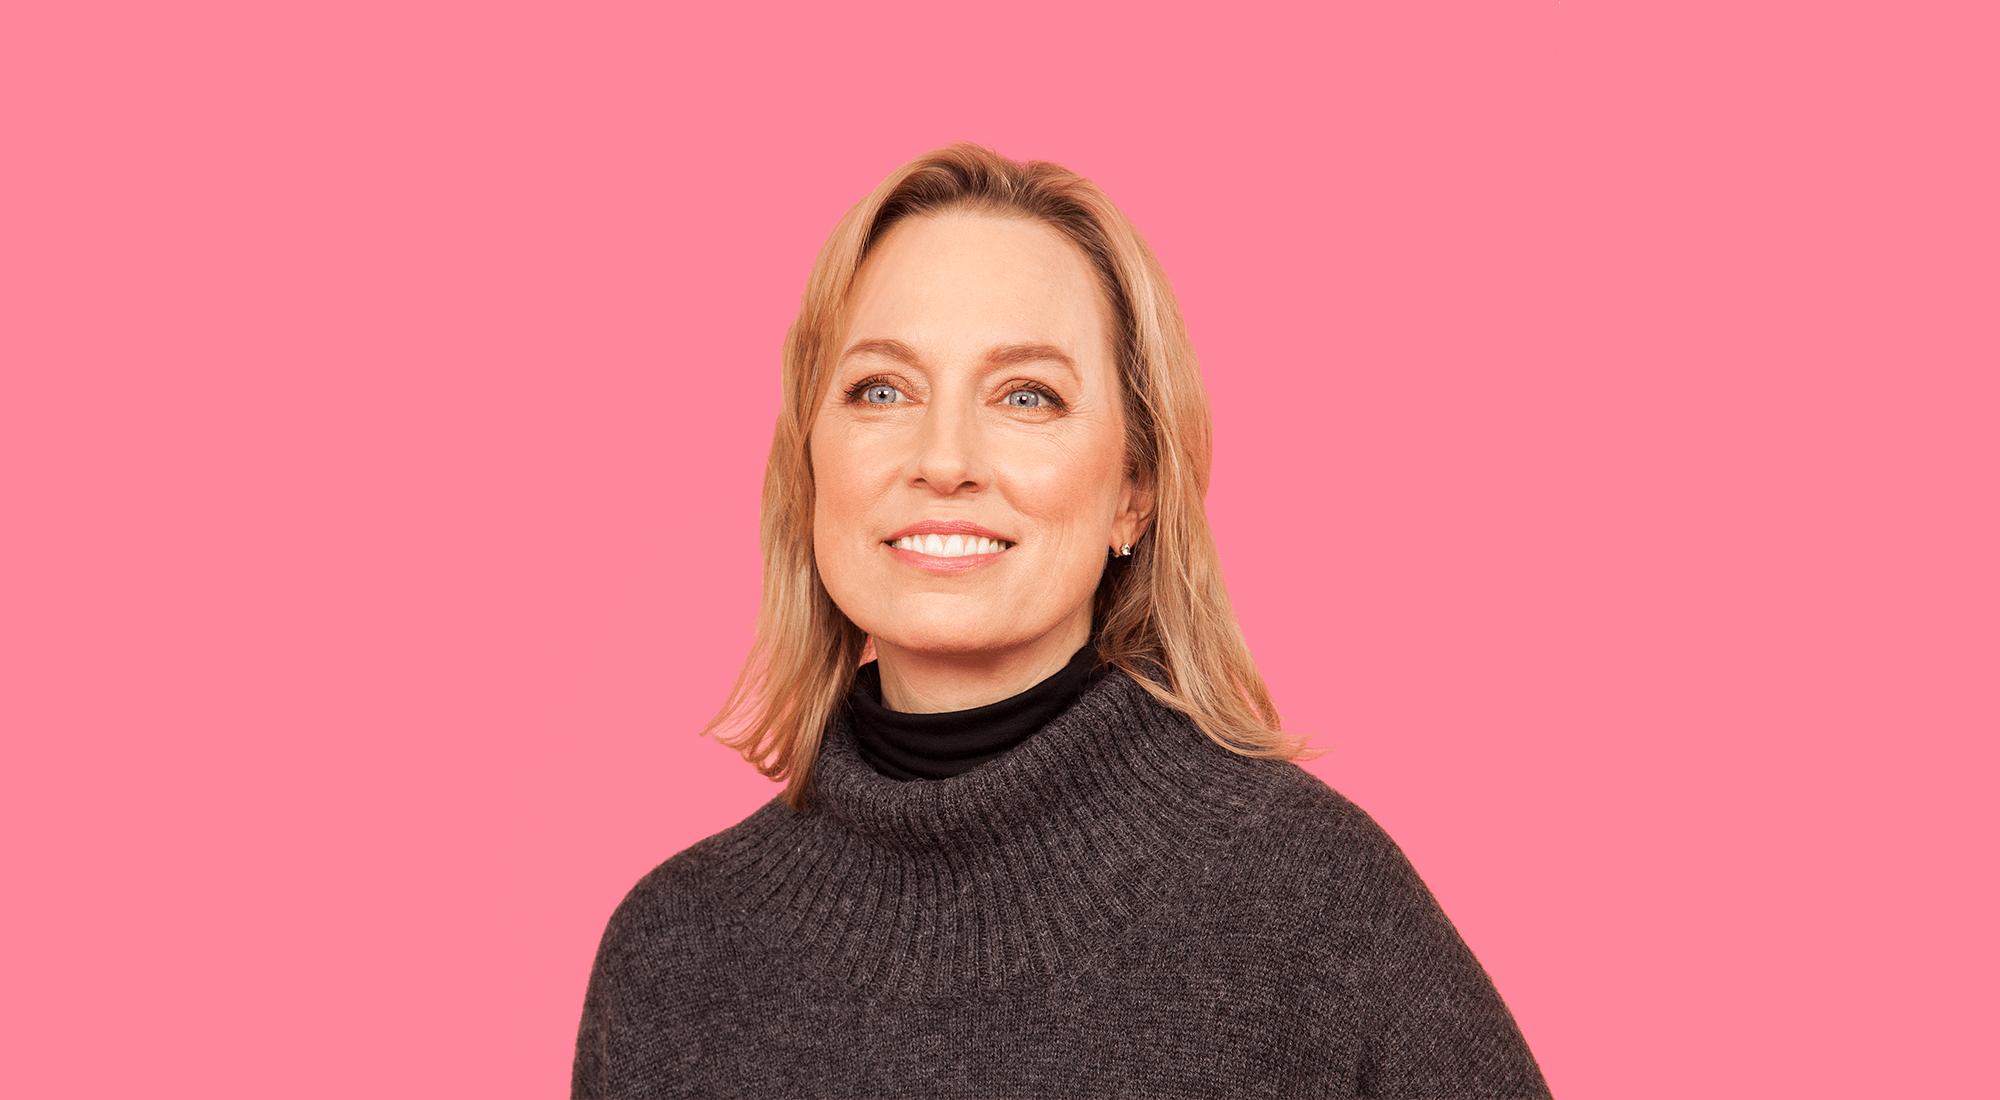 Funding the next wave of women entrepreneurs